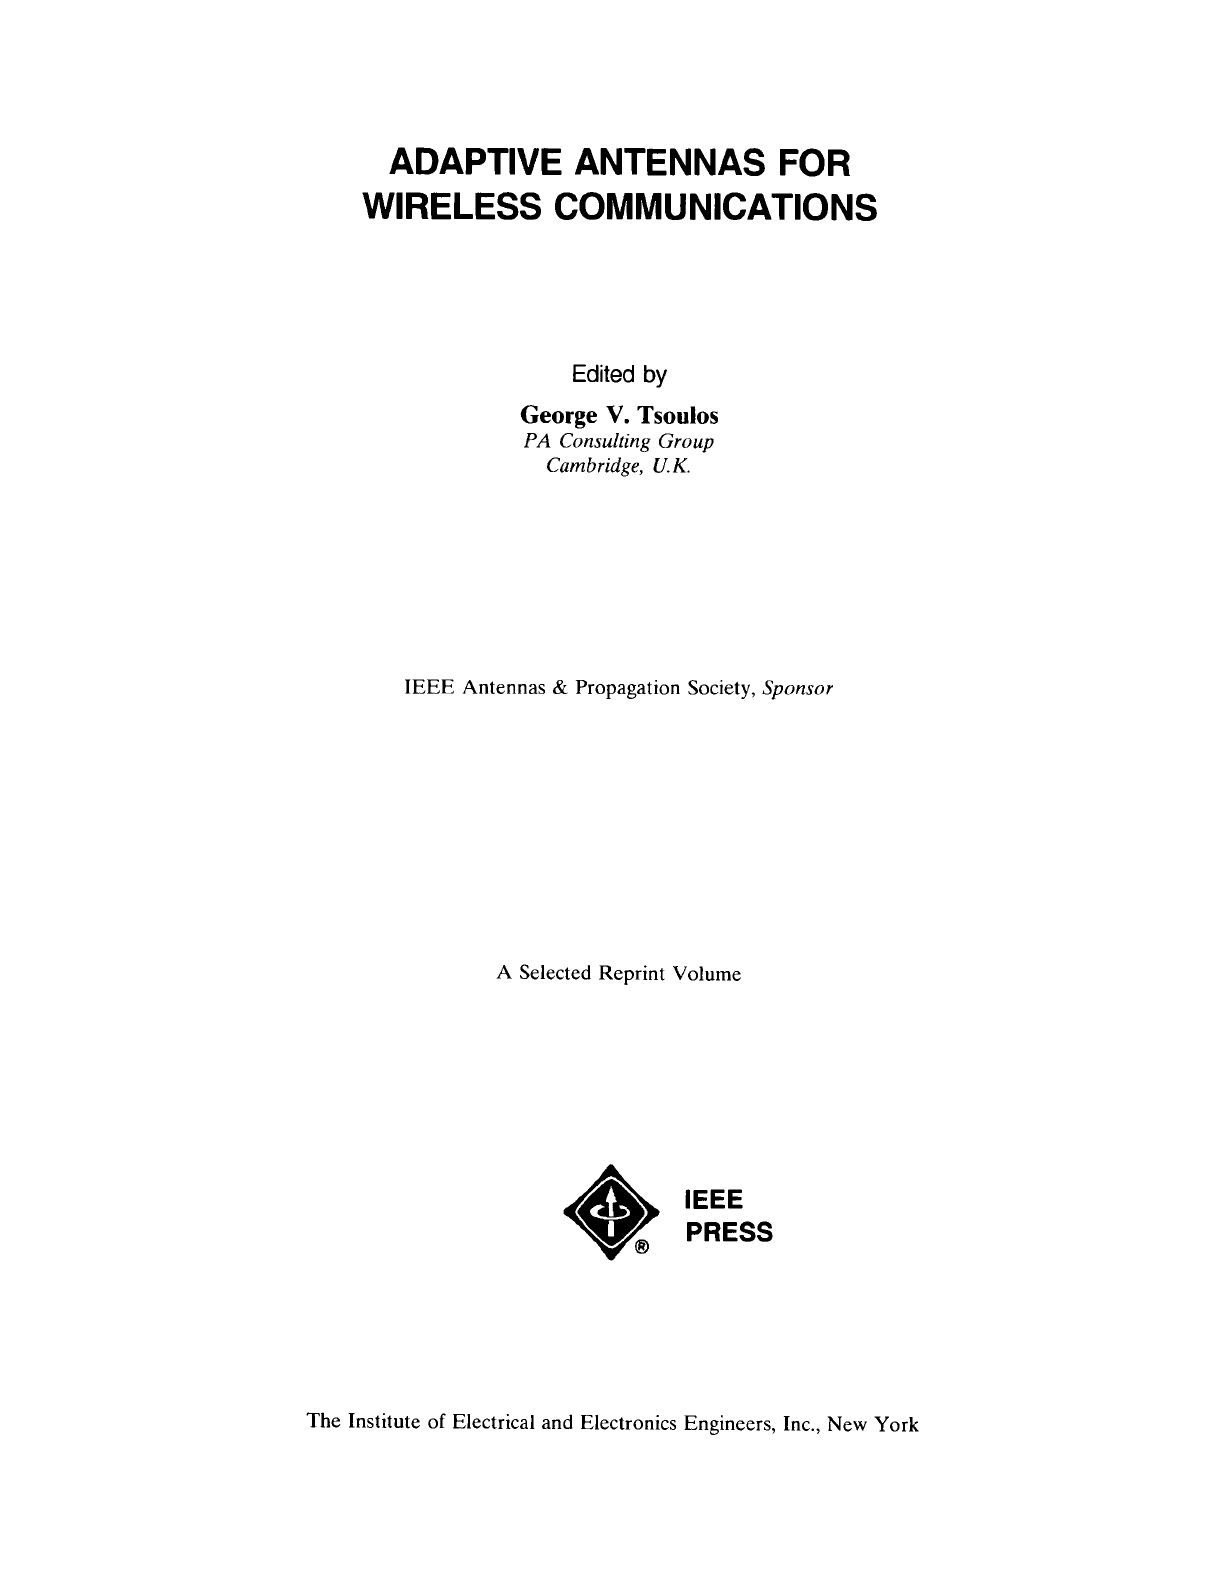 Sensational George V Tsoulos Adaptive Antennas For Wireless Bookzz Org Pdf Wiring Cloud Cranvenetmohammedshrineorg